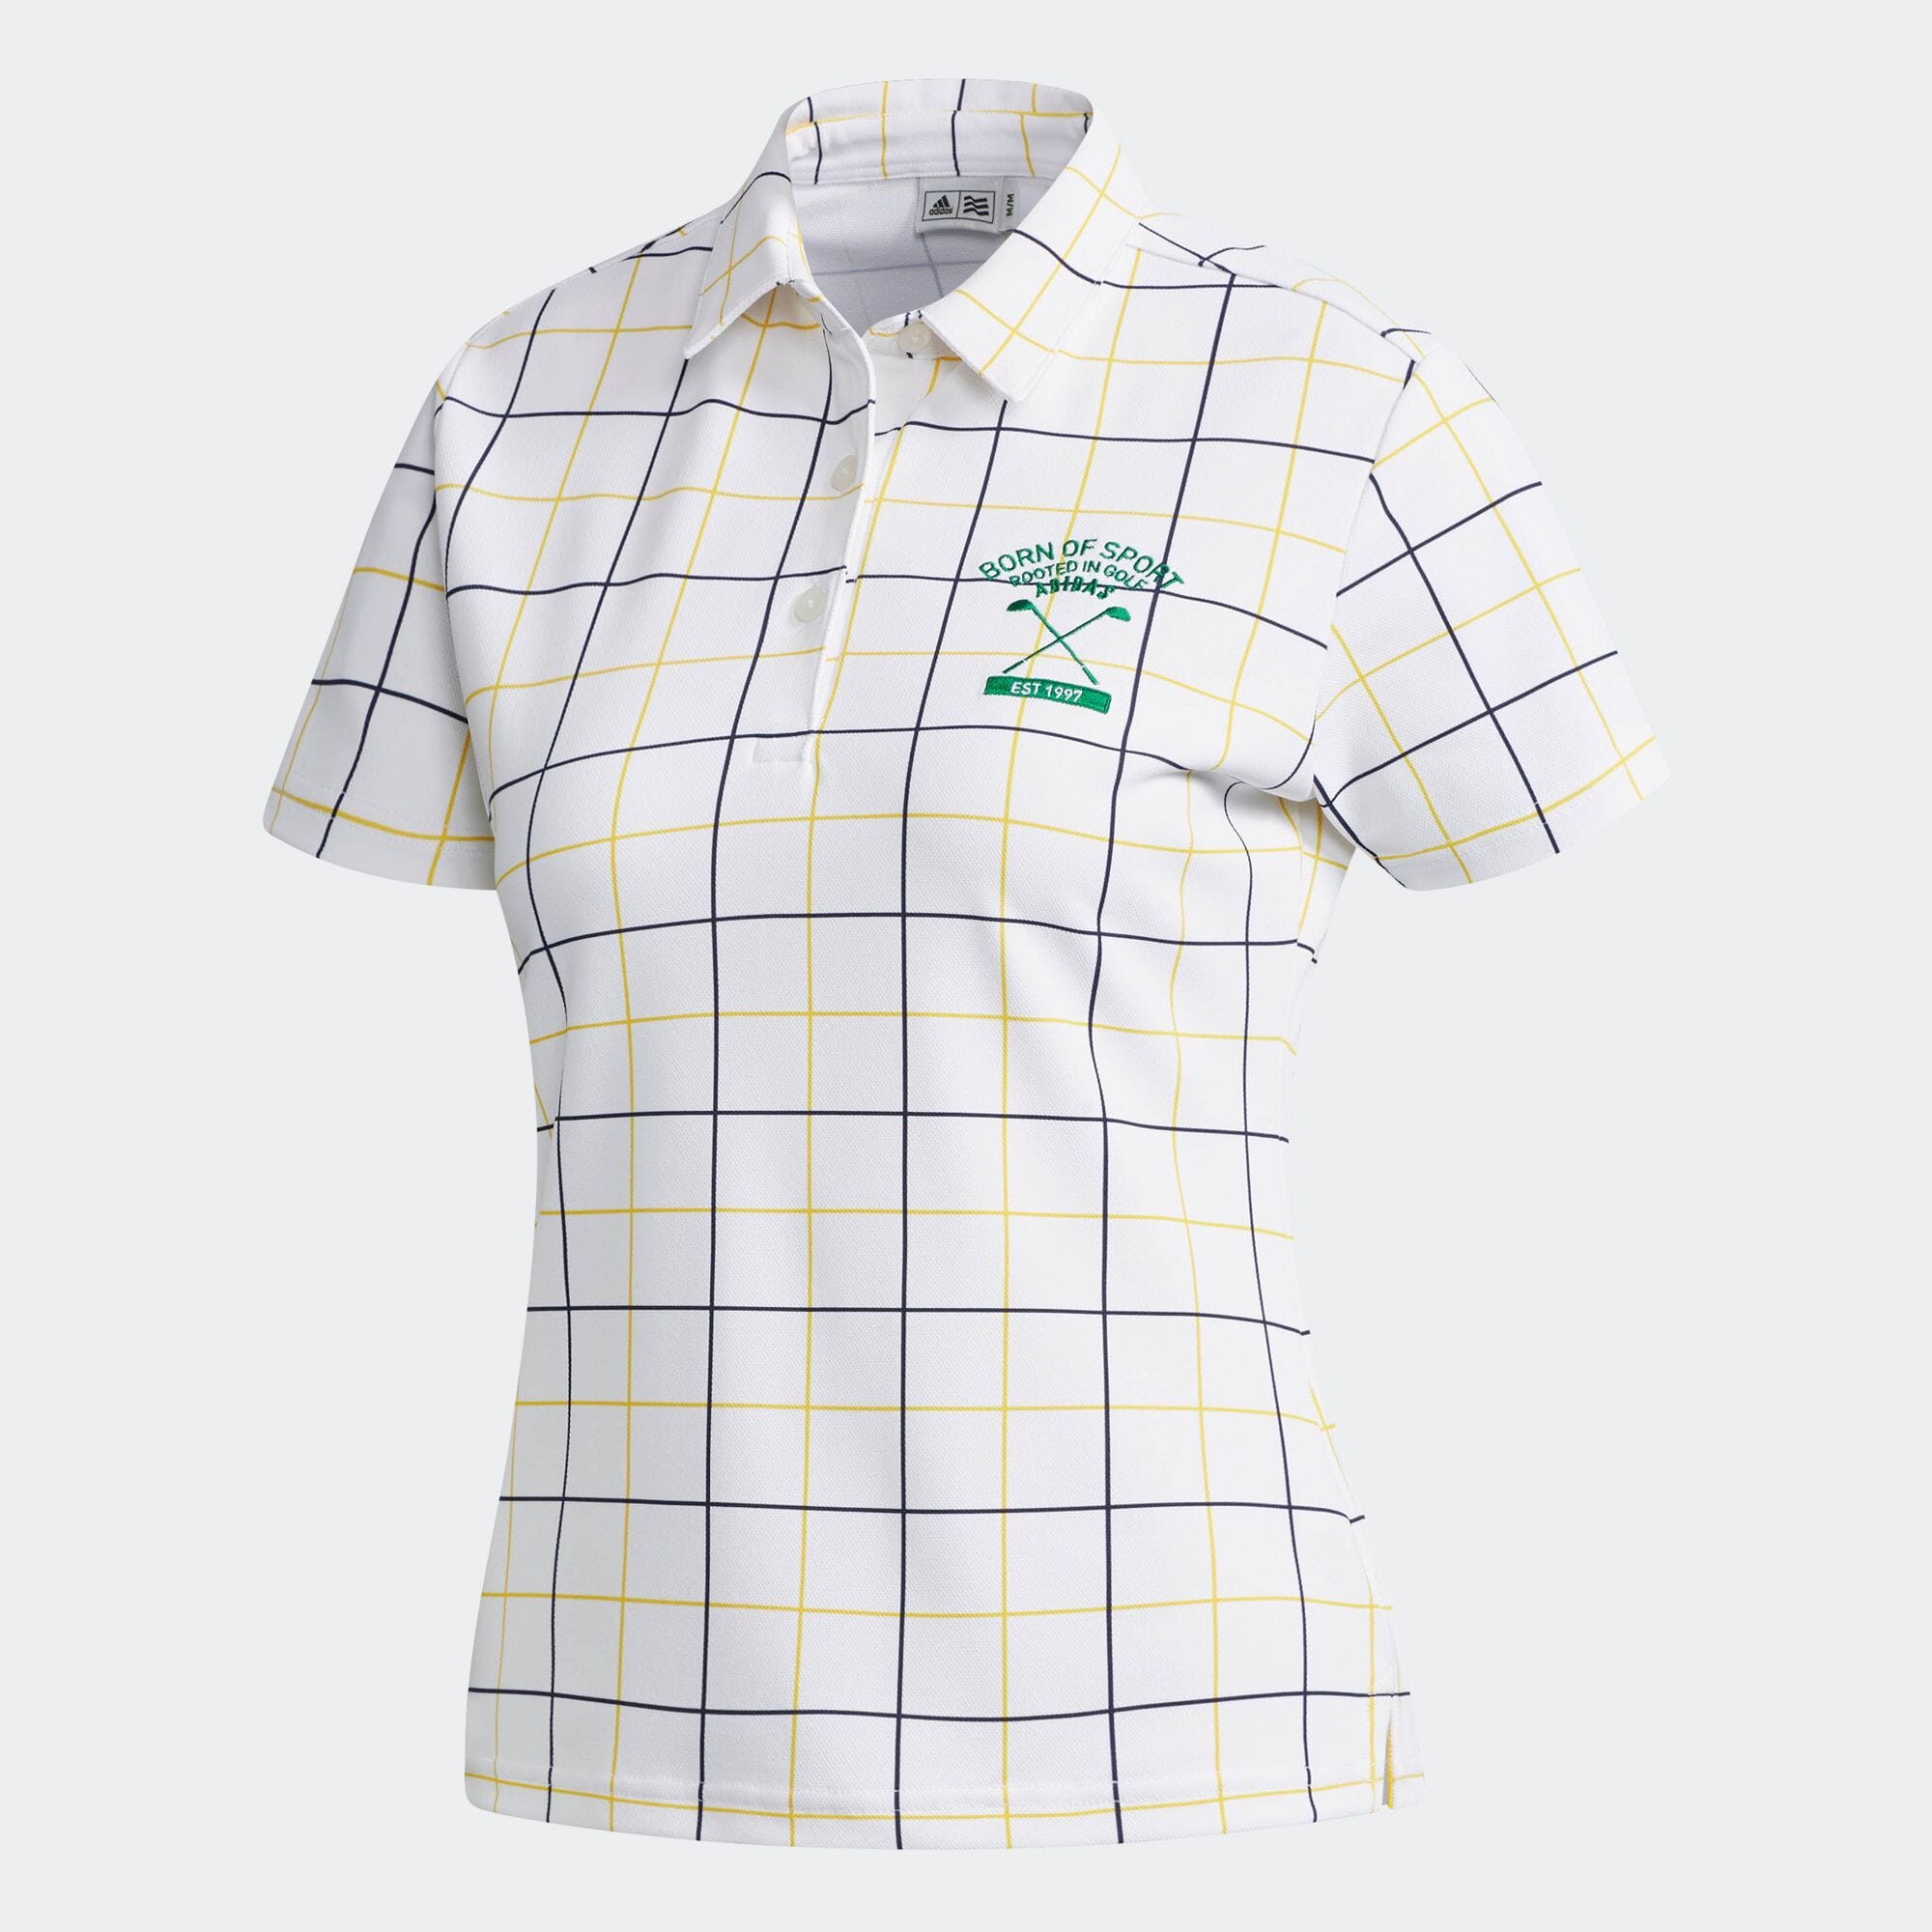 adicross チェックプリント 半袖シャツ 【ゴルフ】